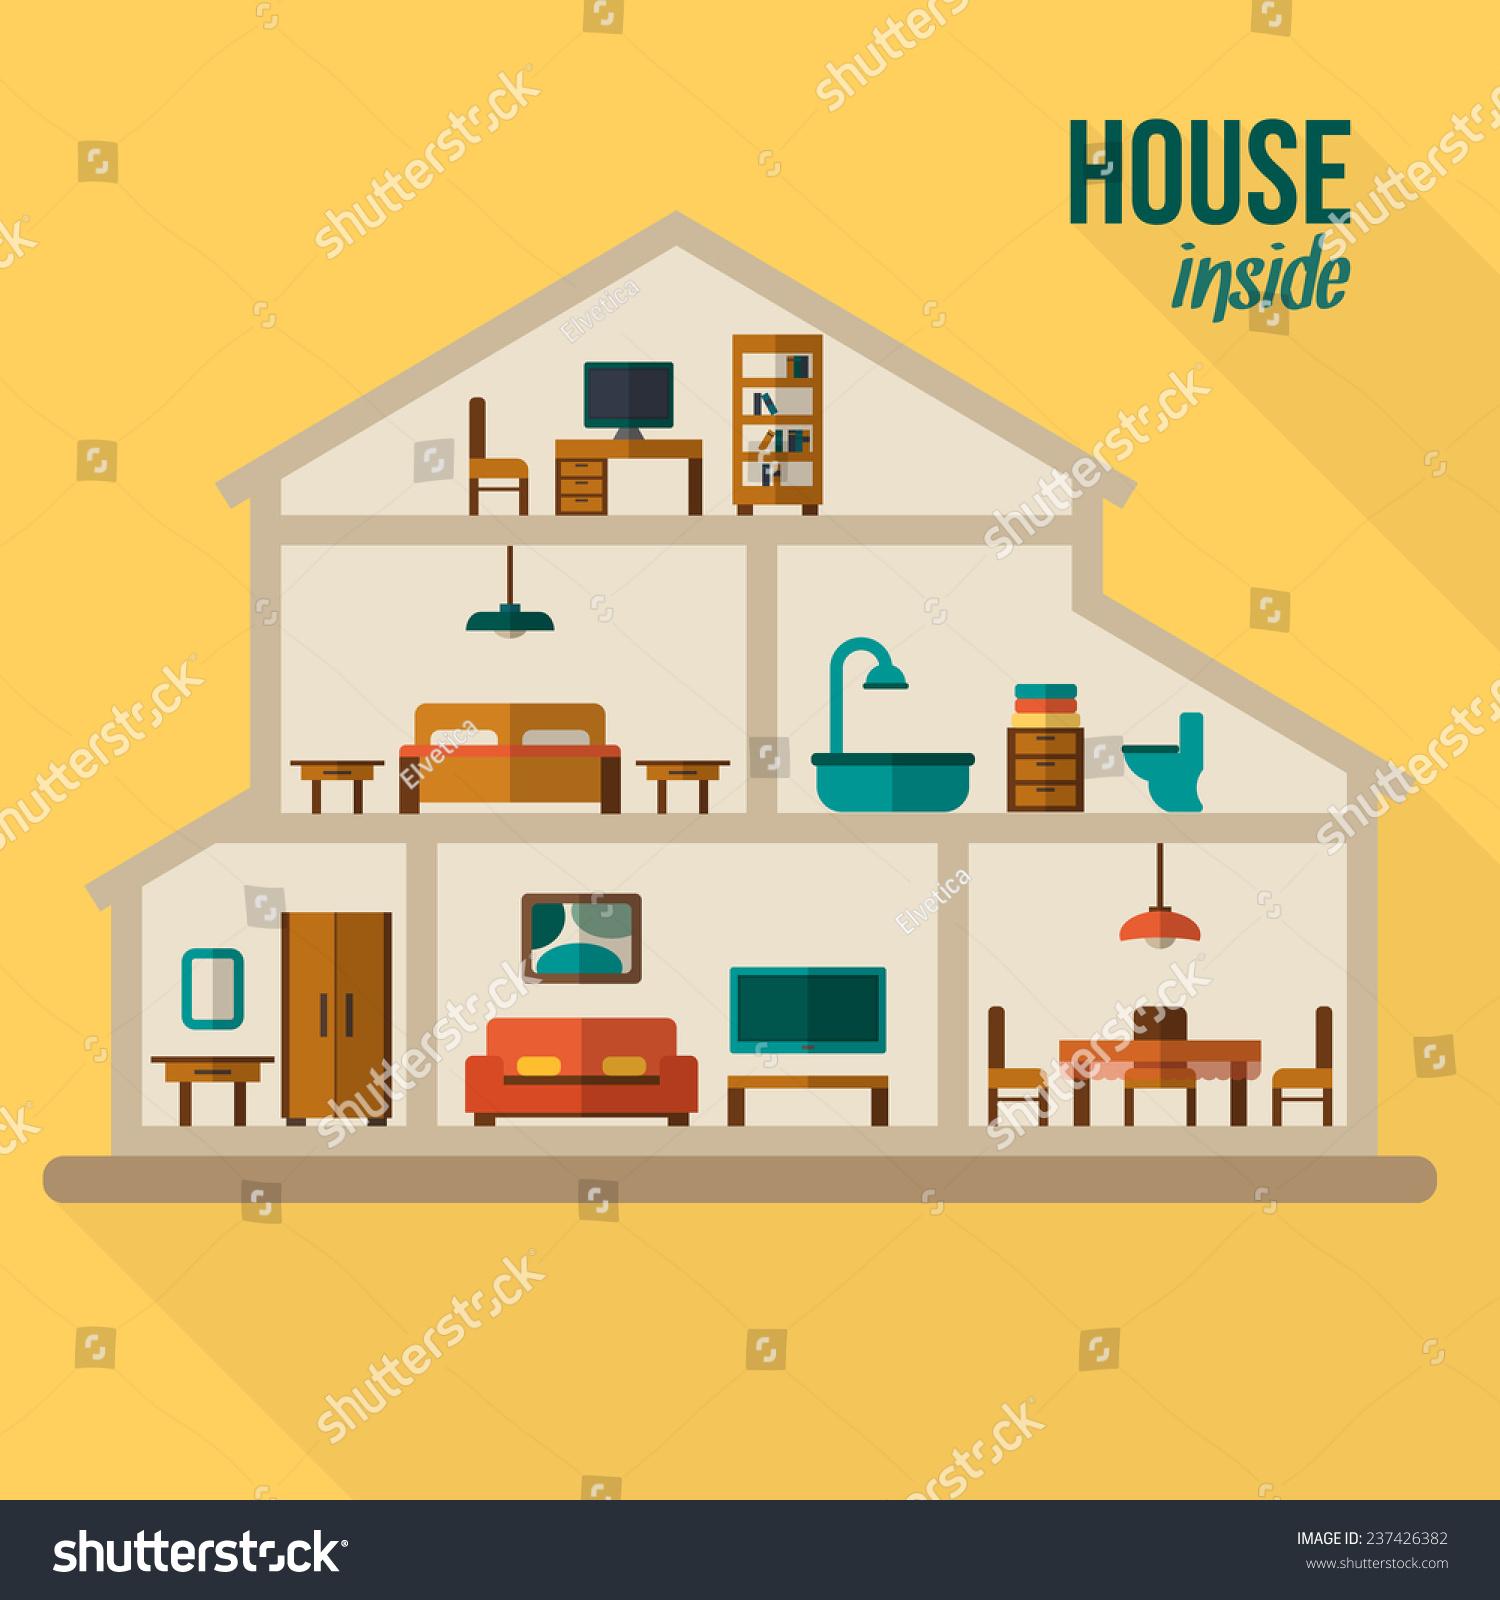 home interior clipart - photo #29